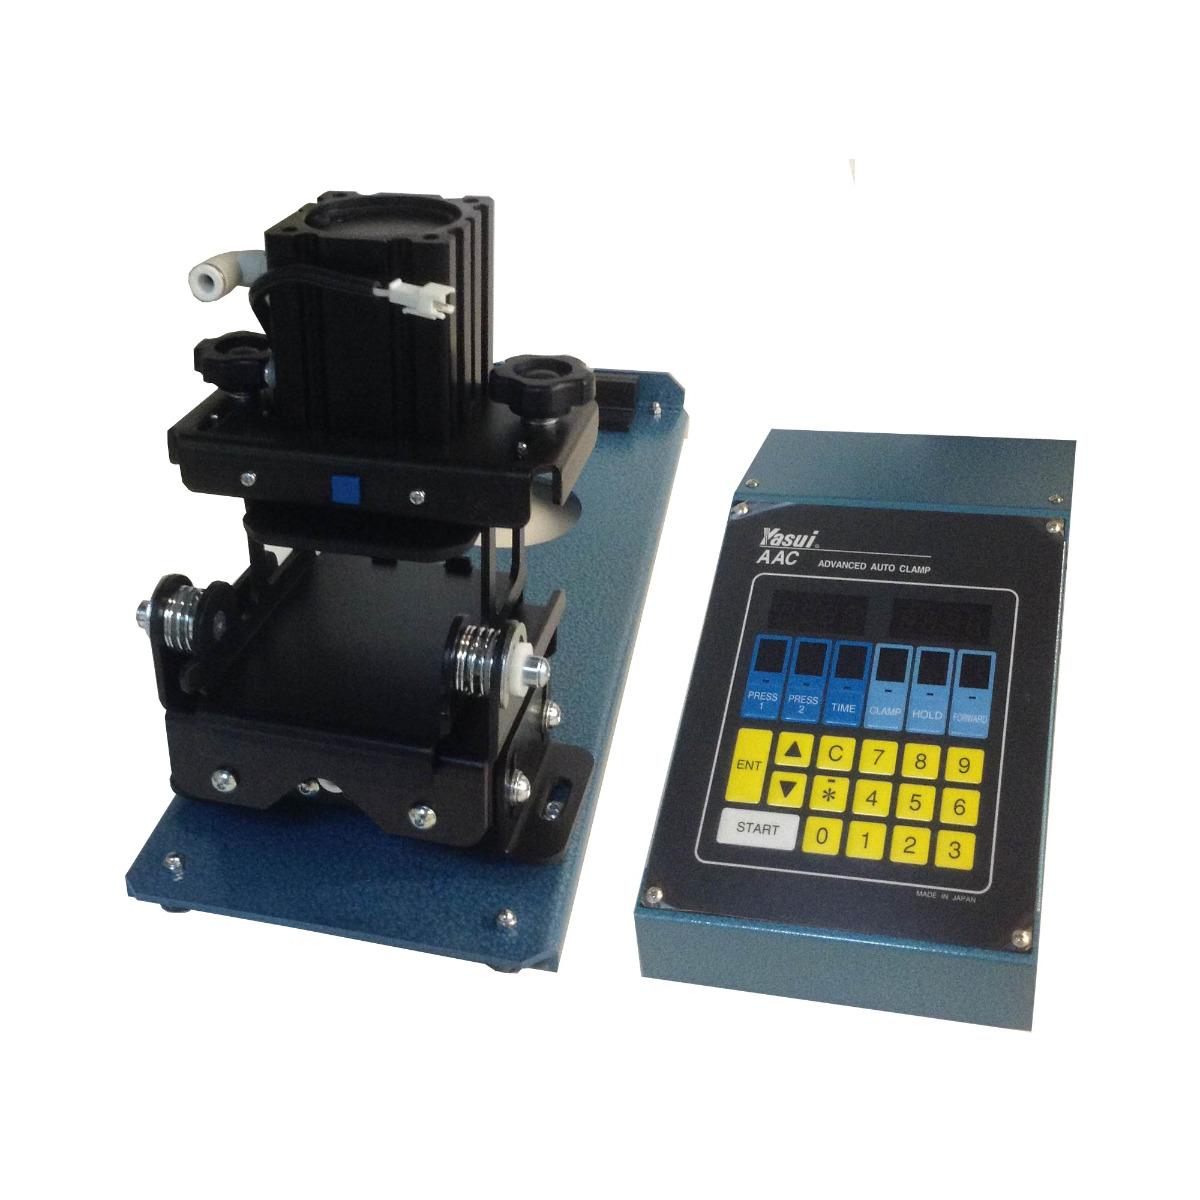 Yasui Standard Mold Clamp & Pressure Controller AACII